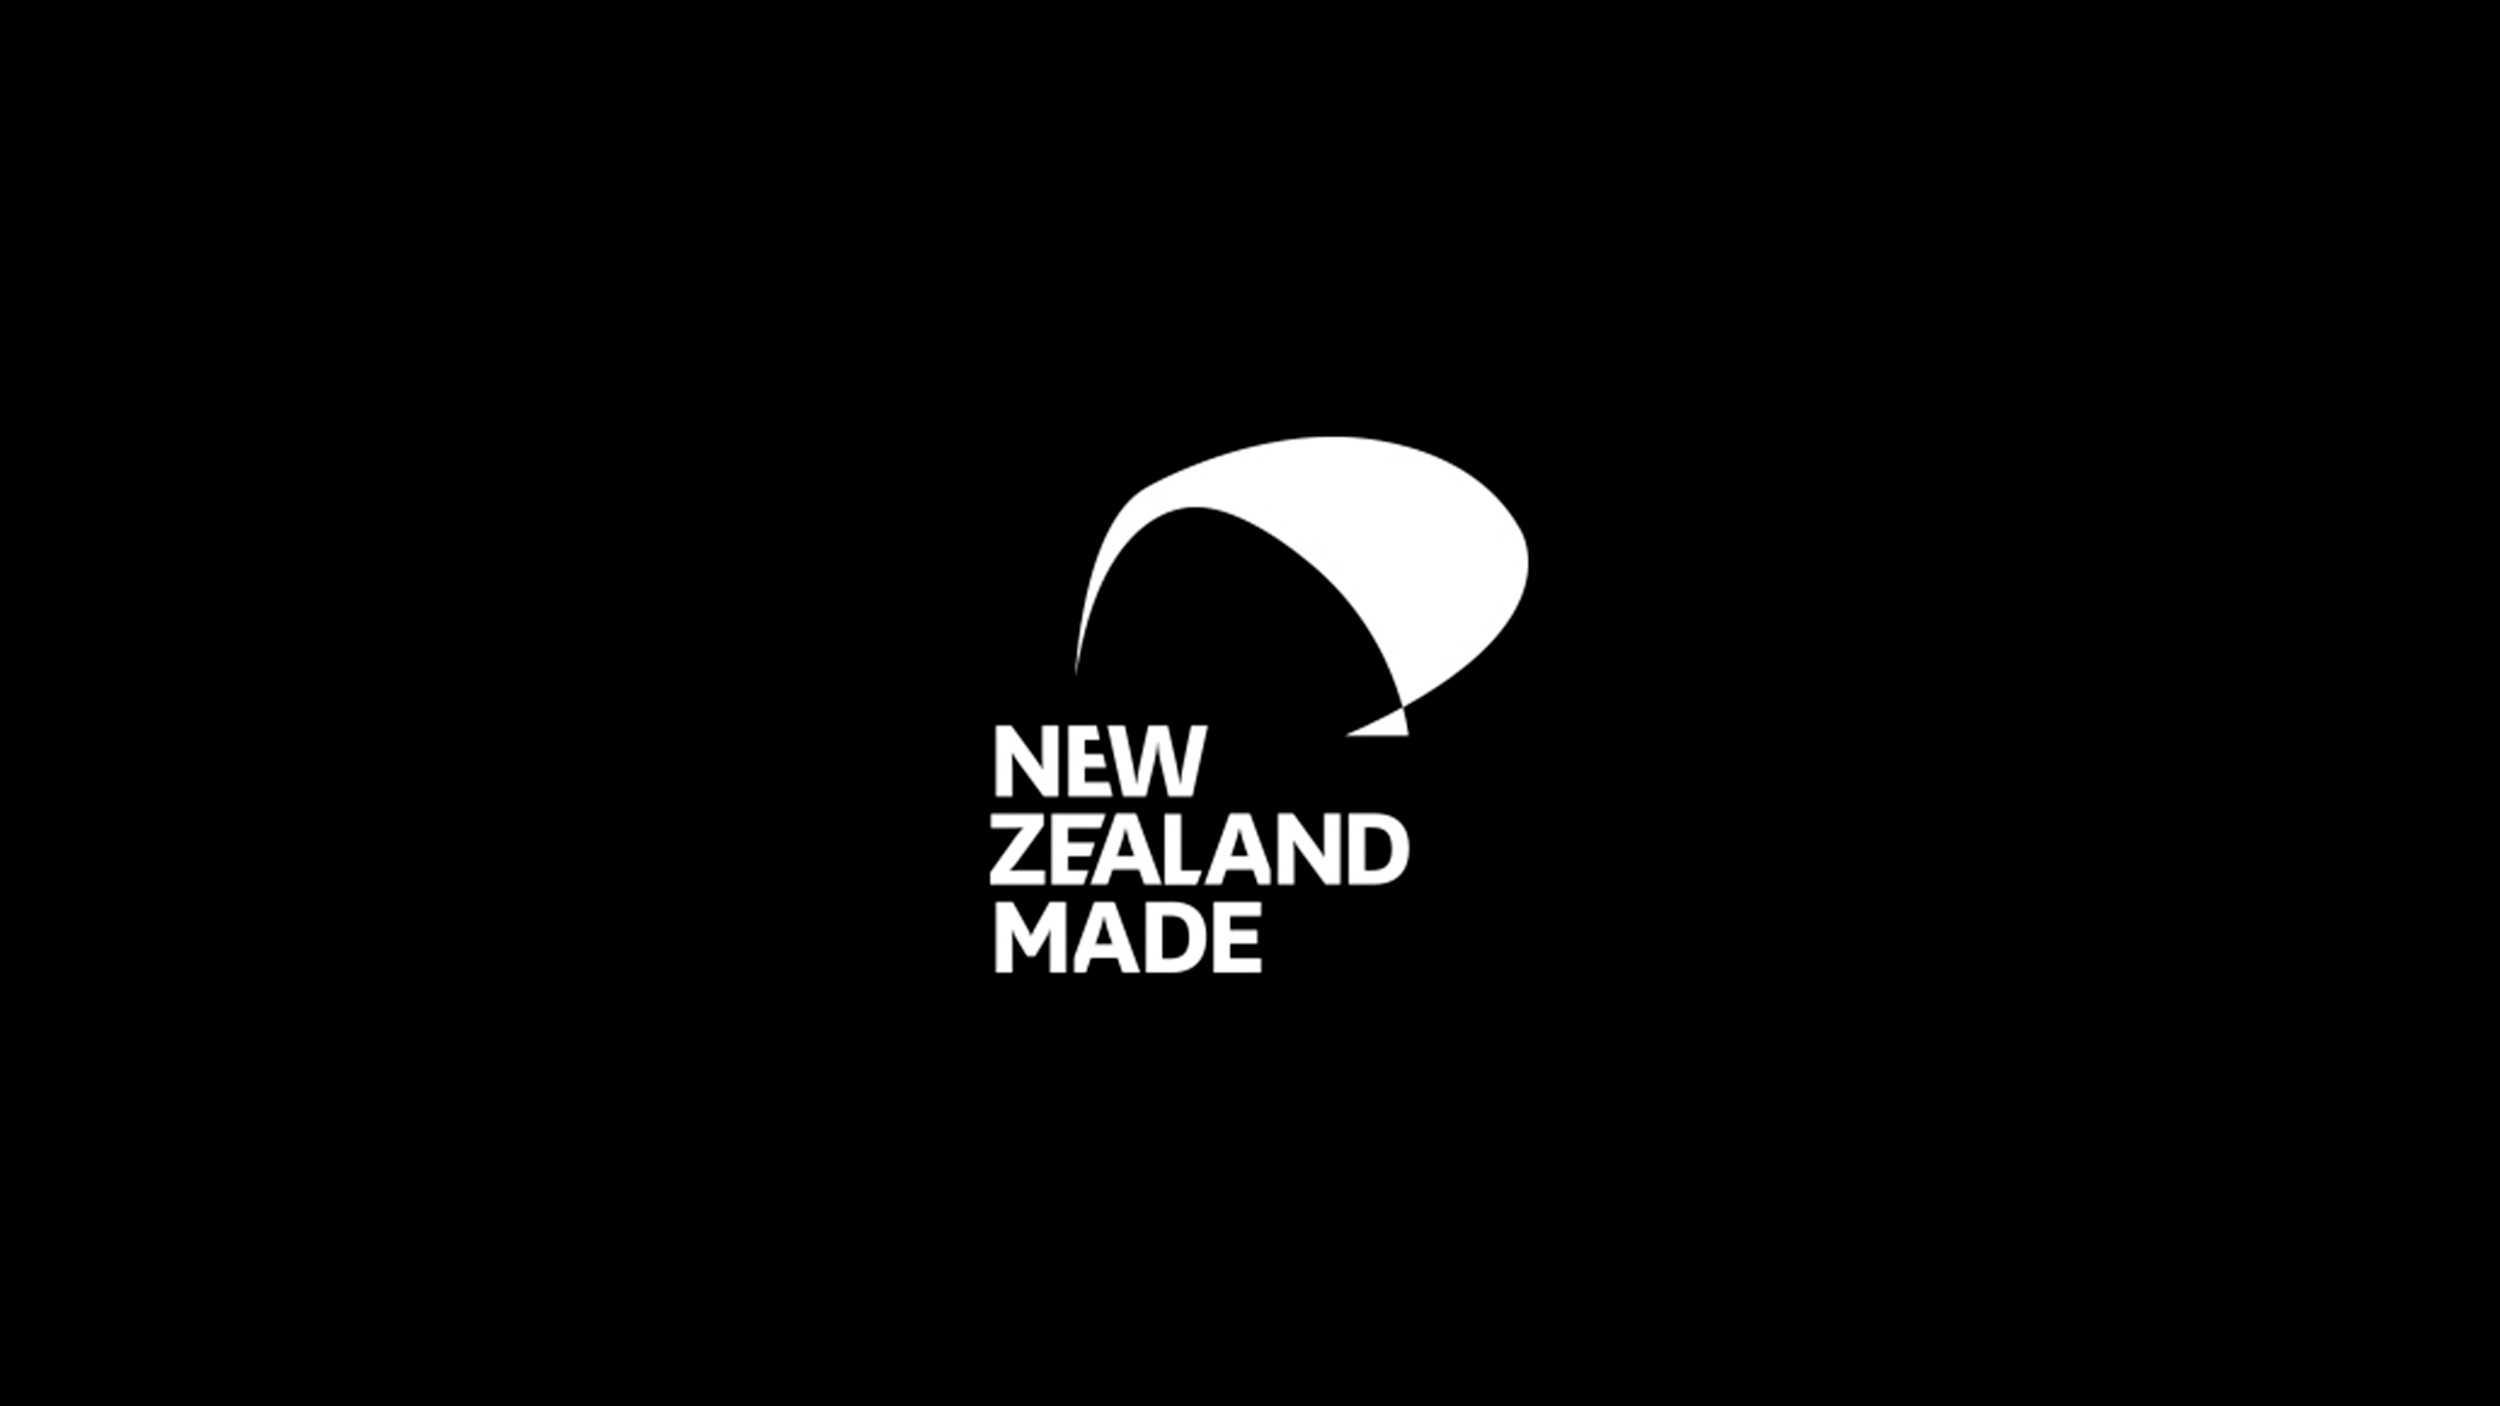 Buy Nz Made Banner